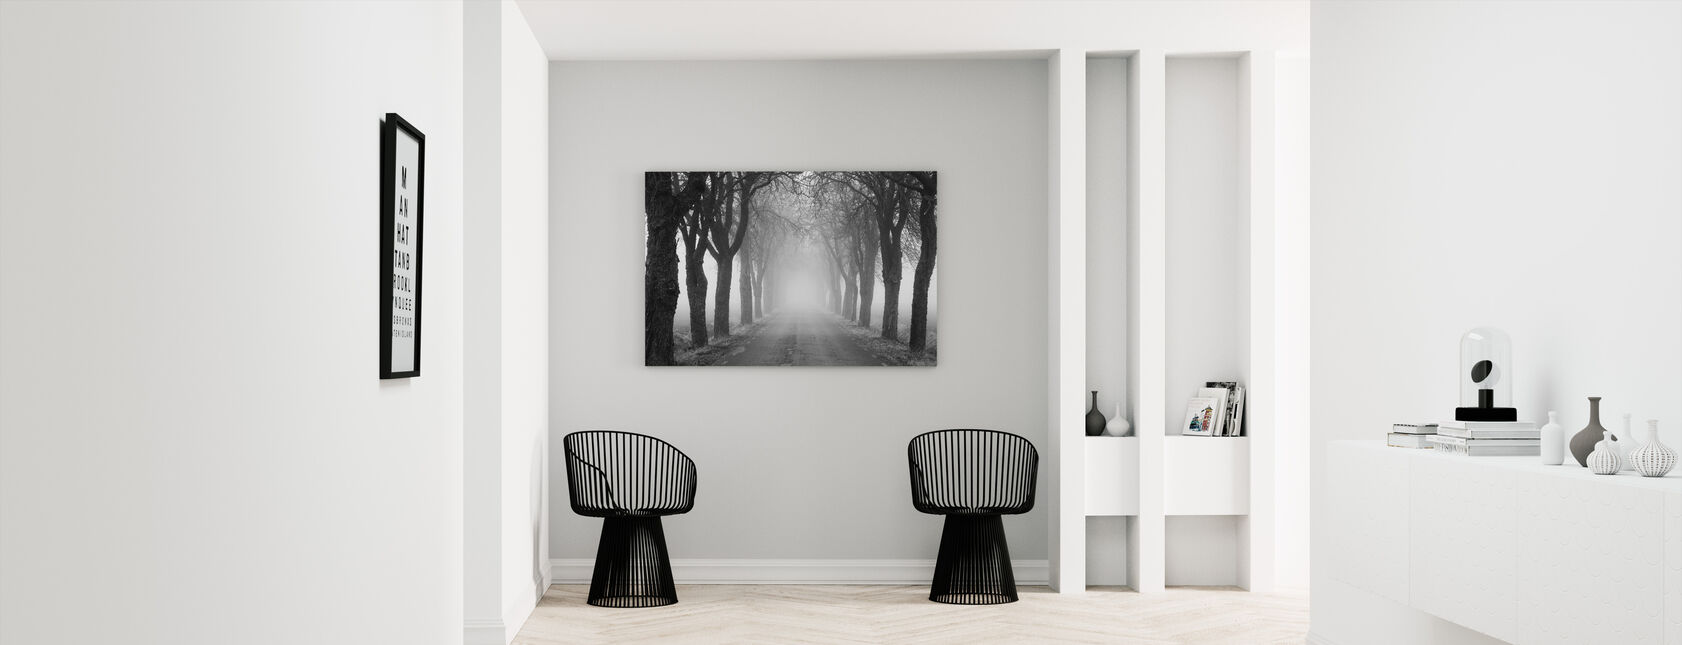 avenue - Canvas print - Hallway